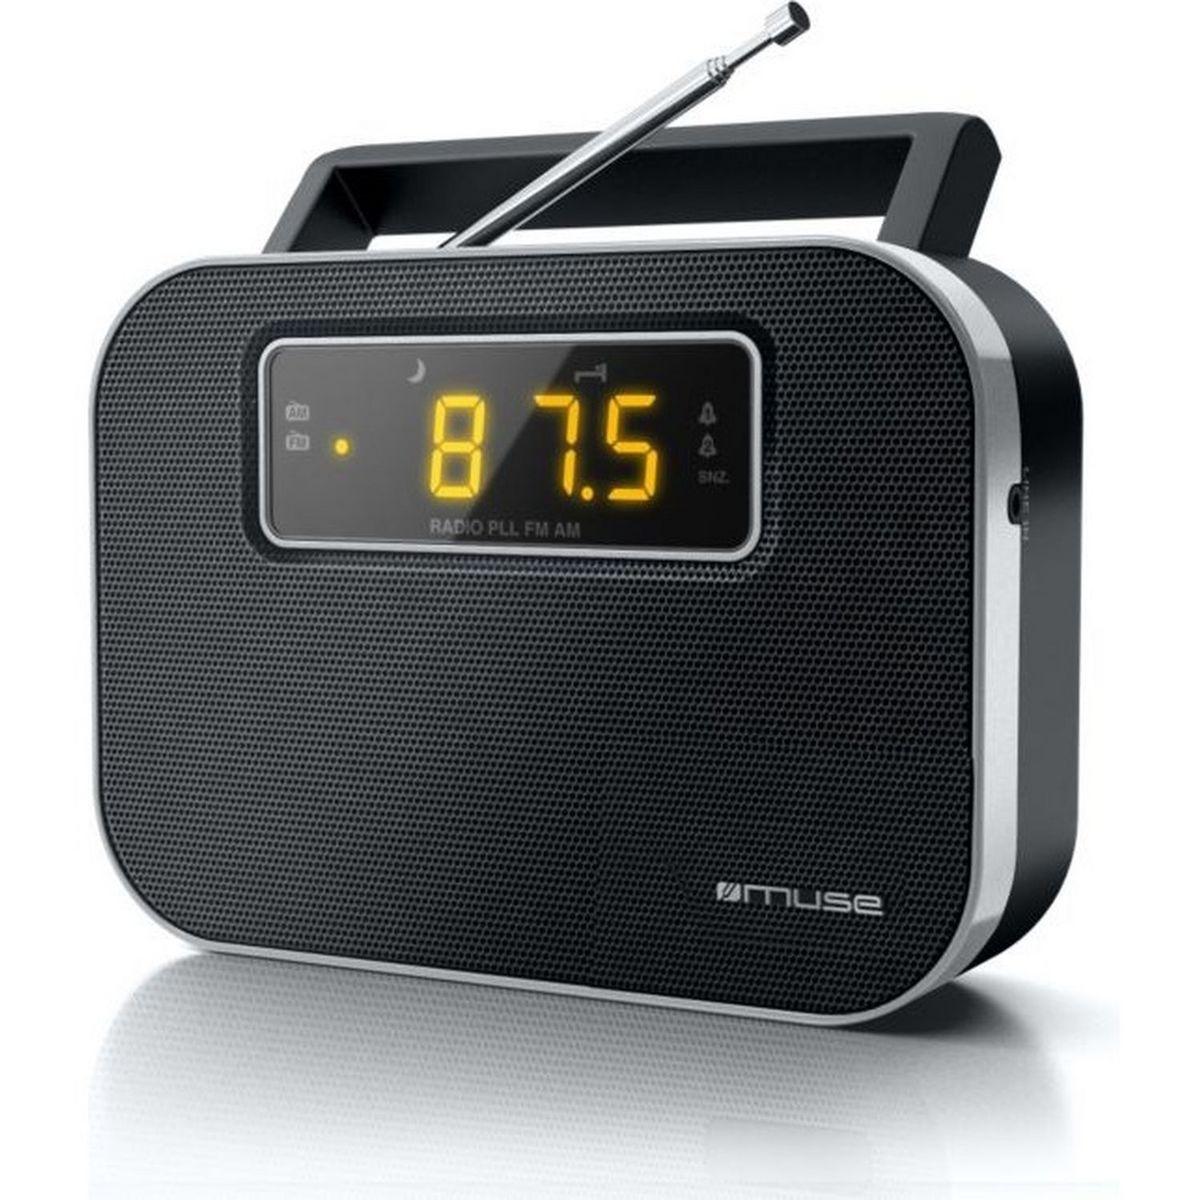 Radio portable - Noir - M-081 R